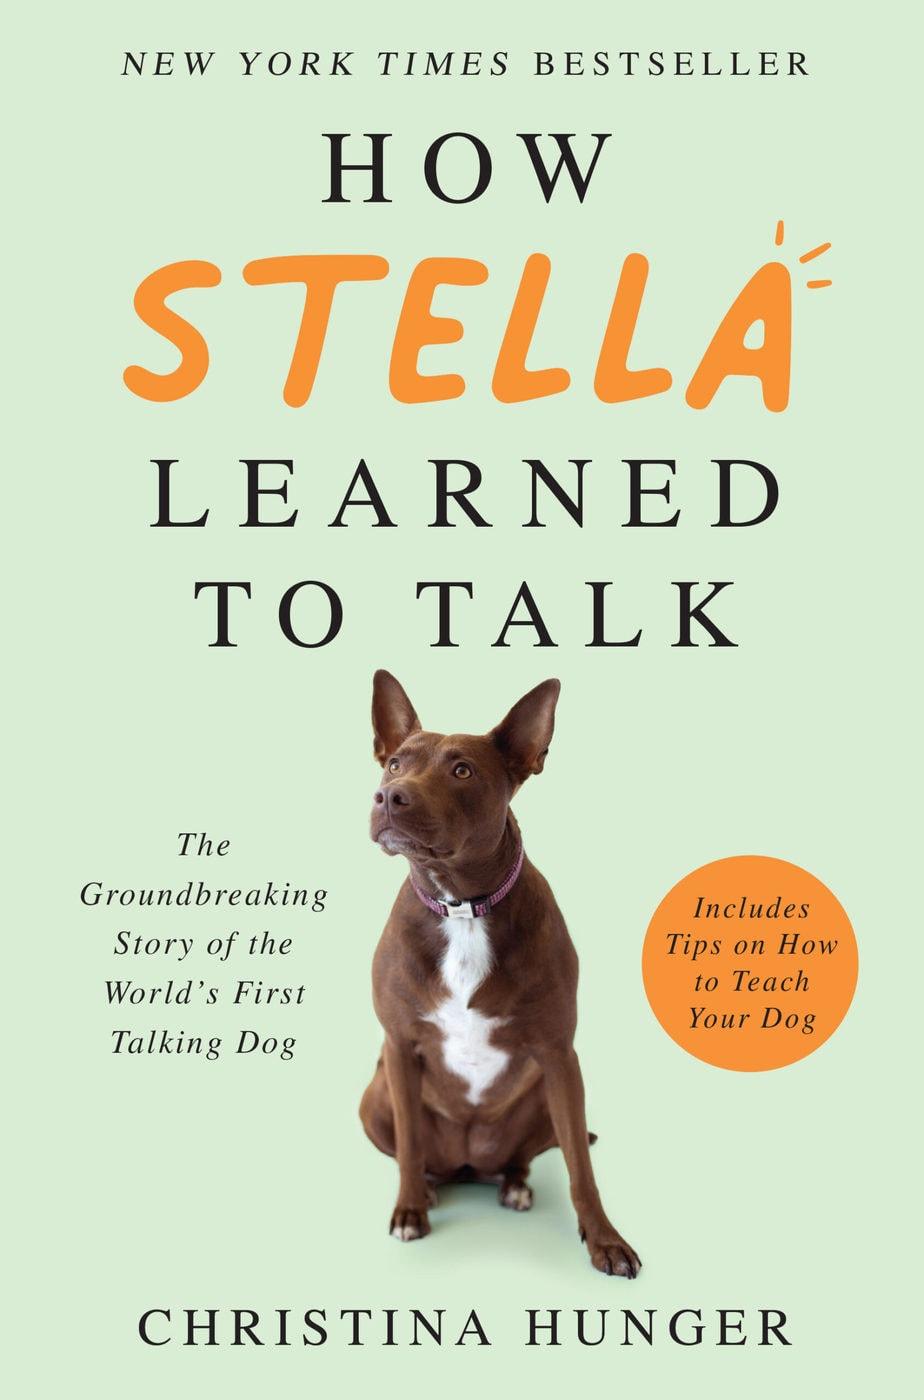 Stella Hardcover Image Nyt Bestseller Scaled